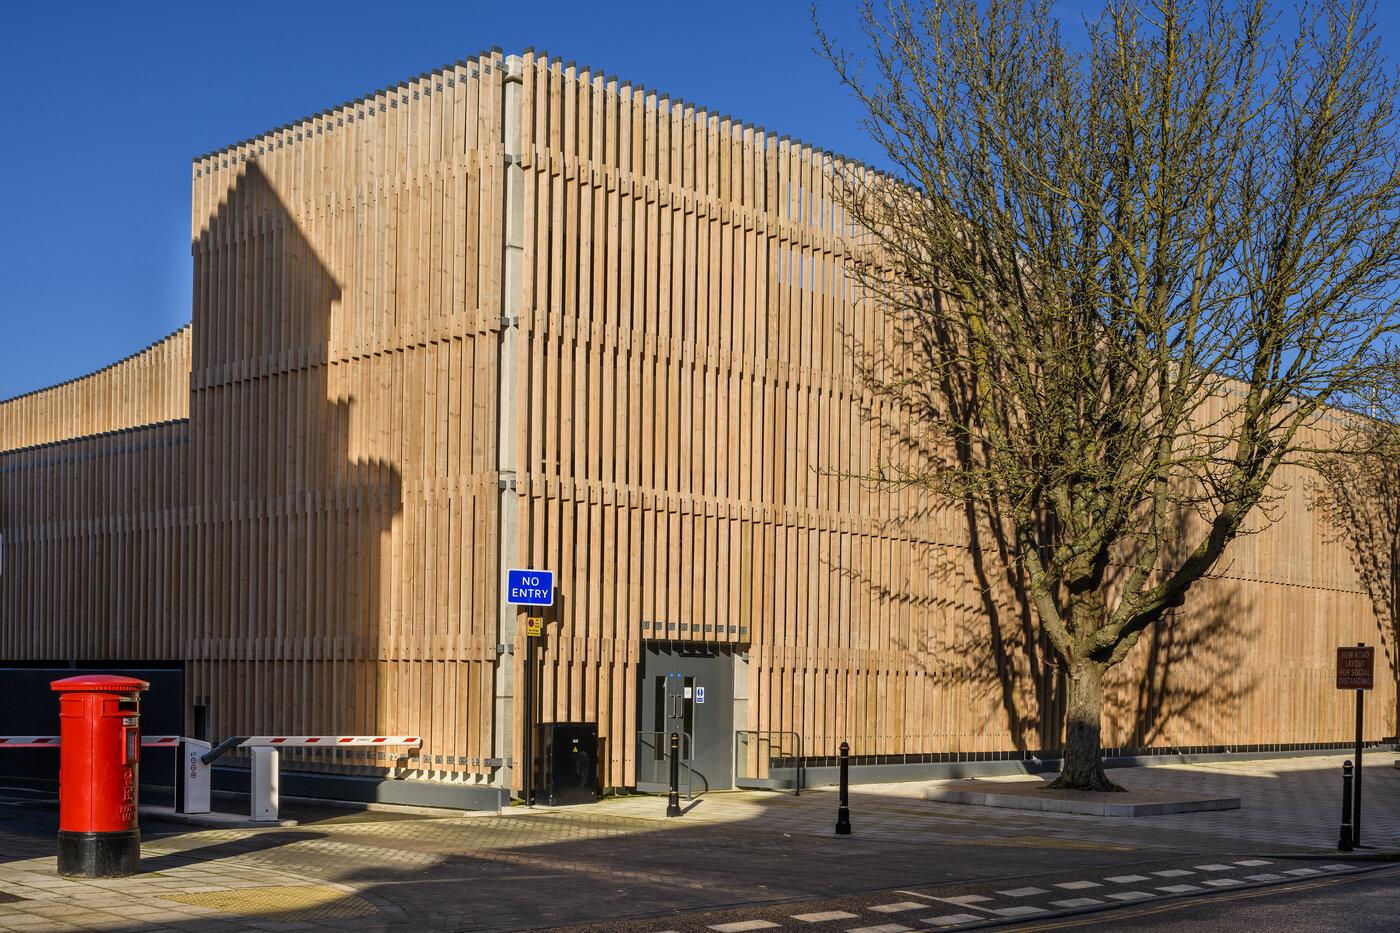 Canterbury West Station multi storey car park built by Bourne Parking